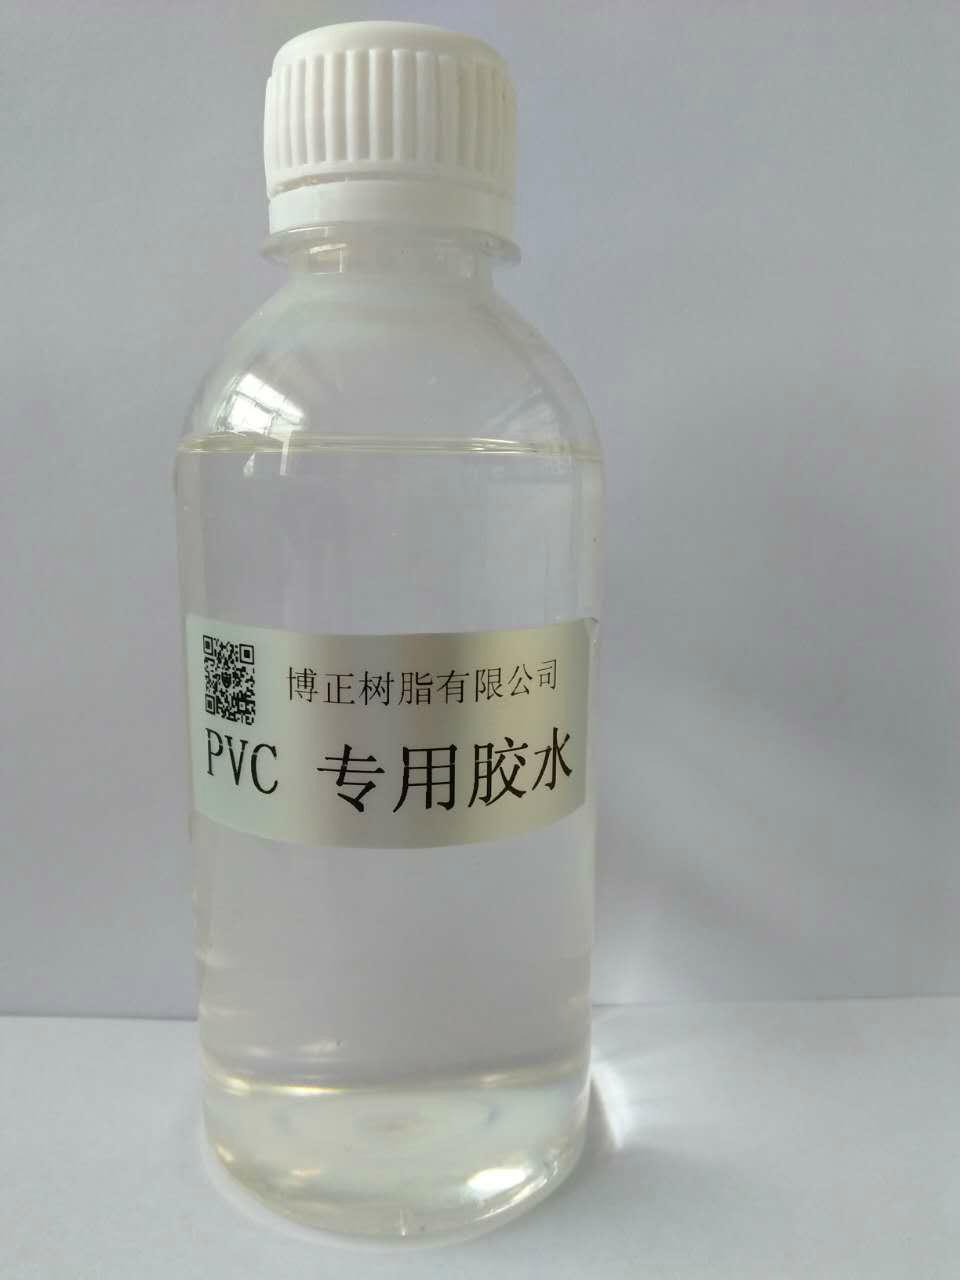 PVC滴塑胶水 2